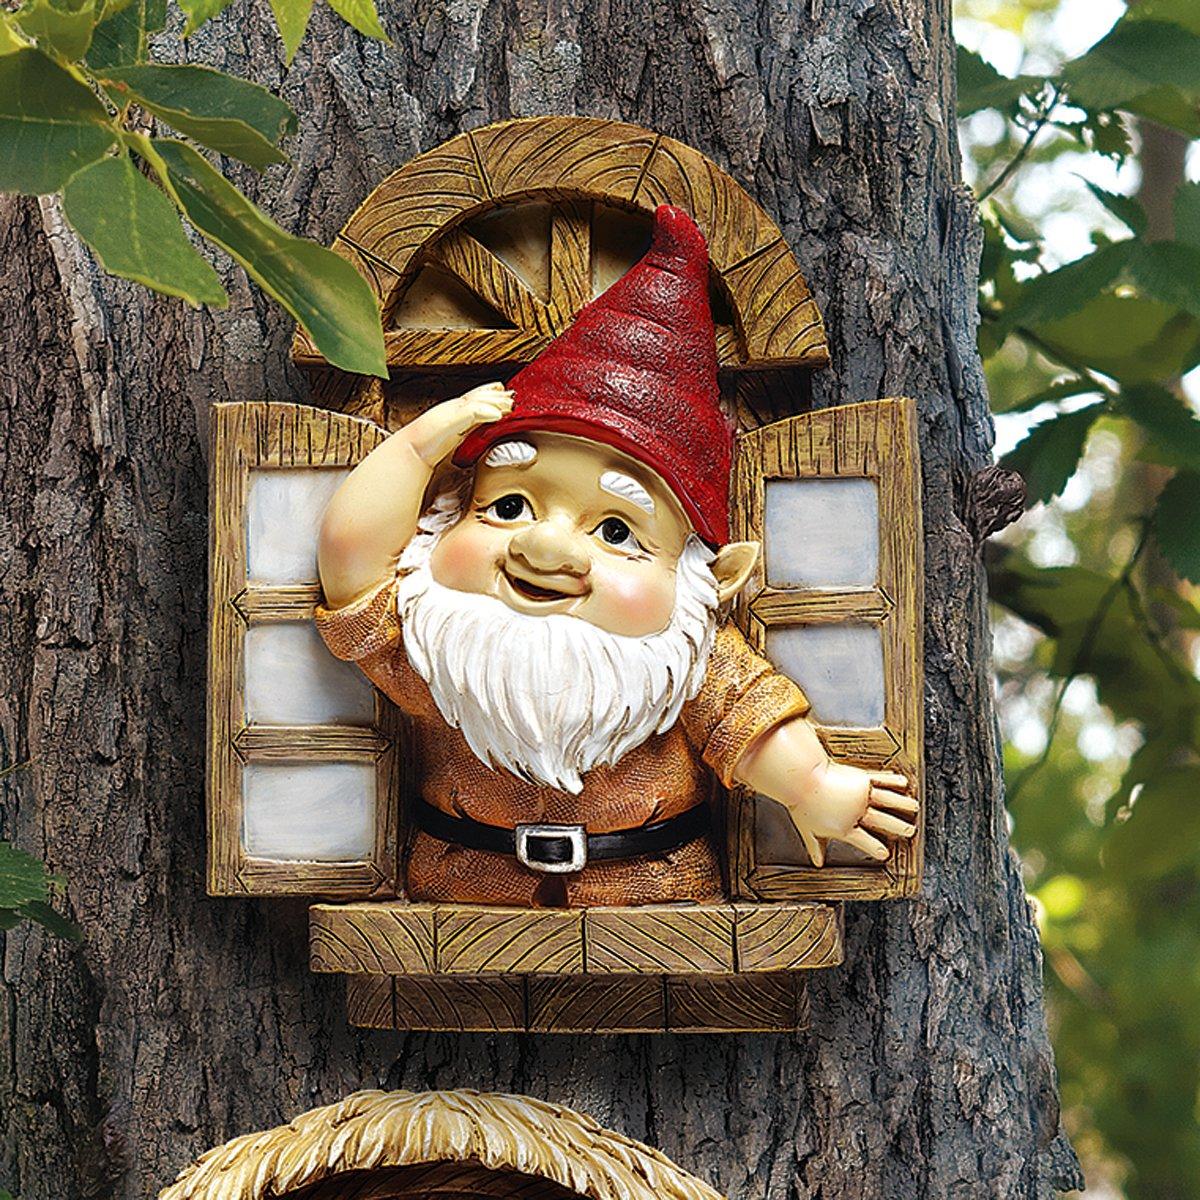 Amazon.com : Design Toscano Garden Gnome Statue - Knothole Welcome ...